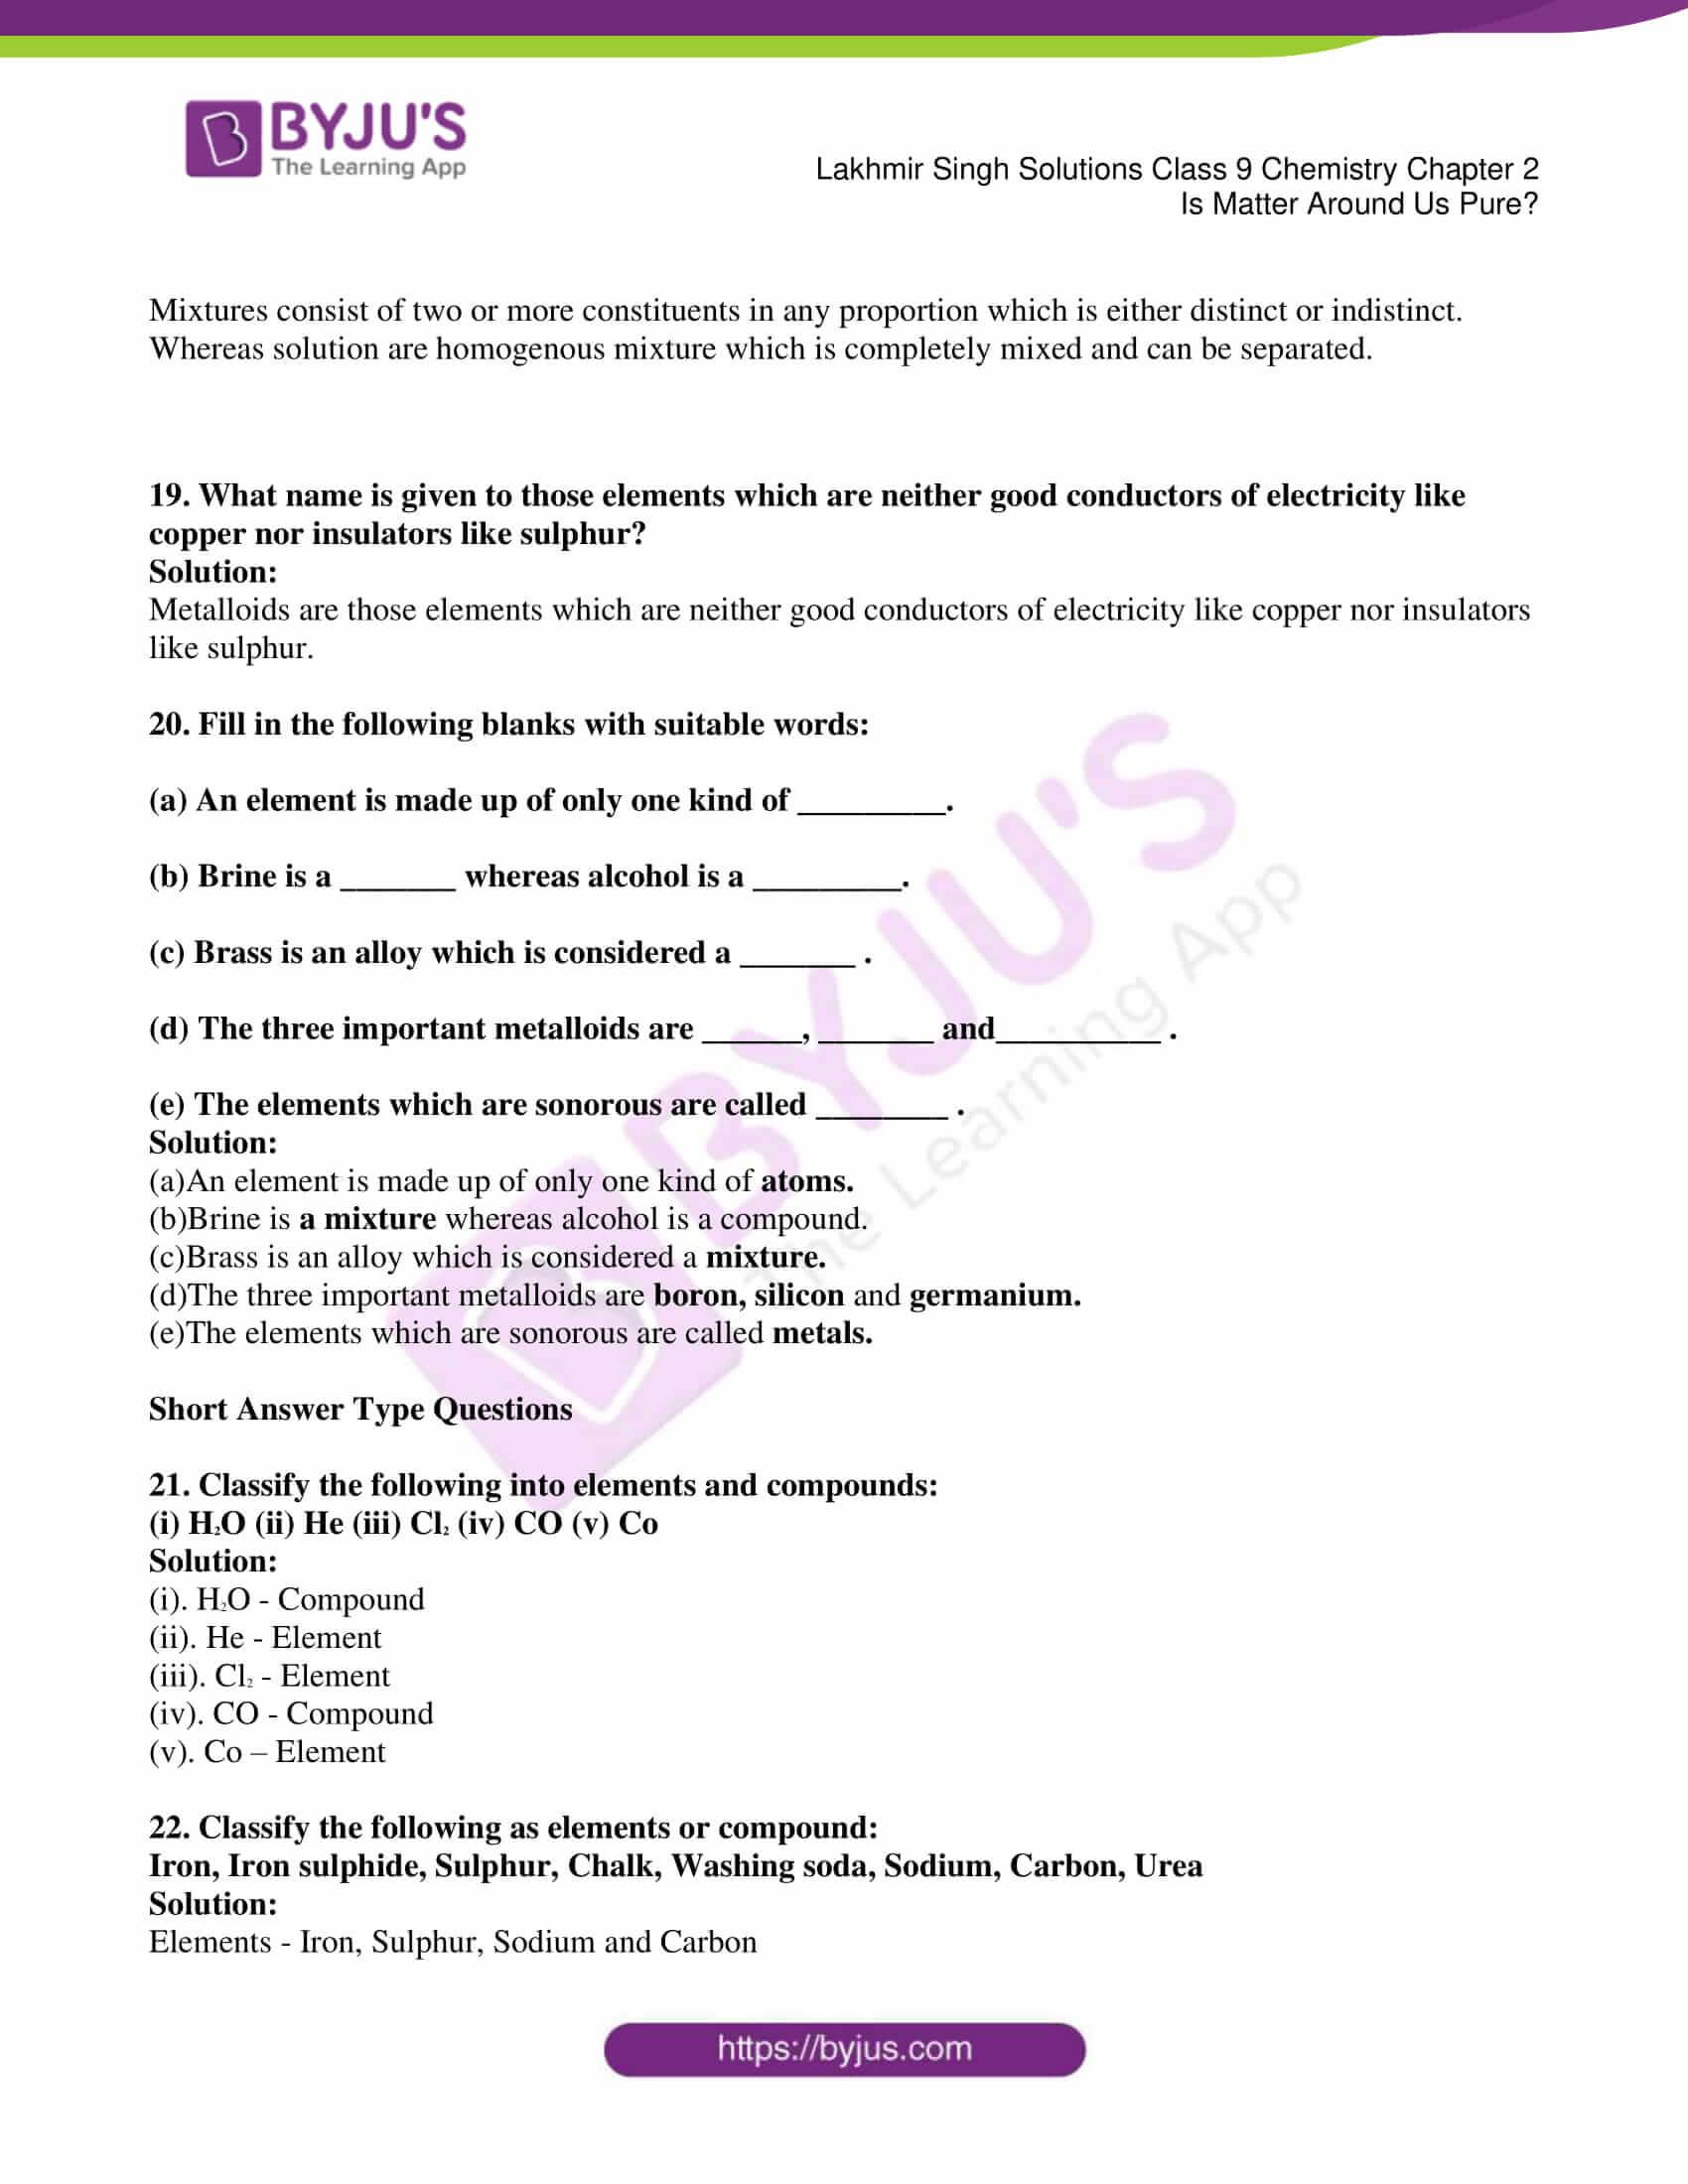 lakhmir singh solutions class 9 chemistry chapter 2 03